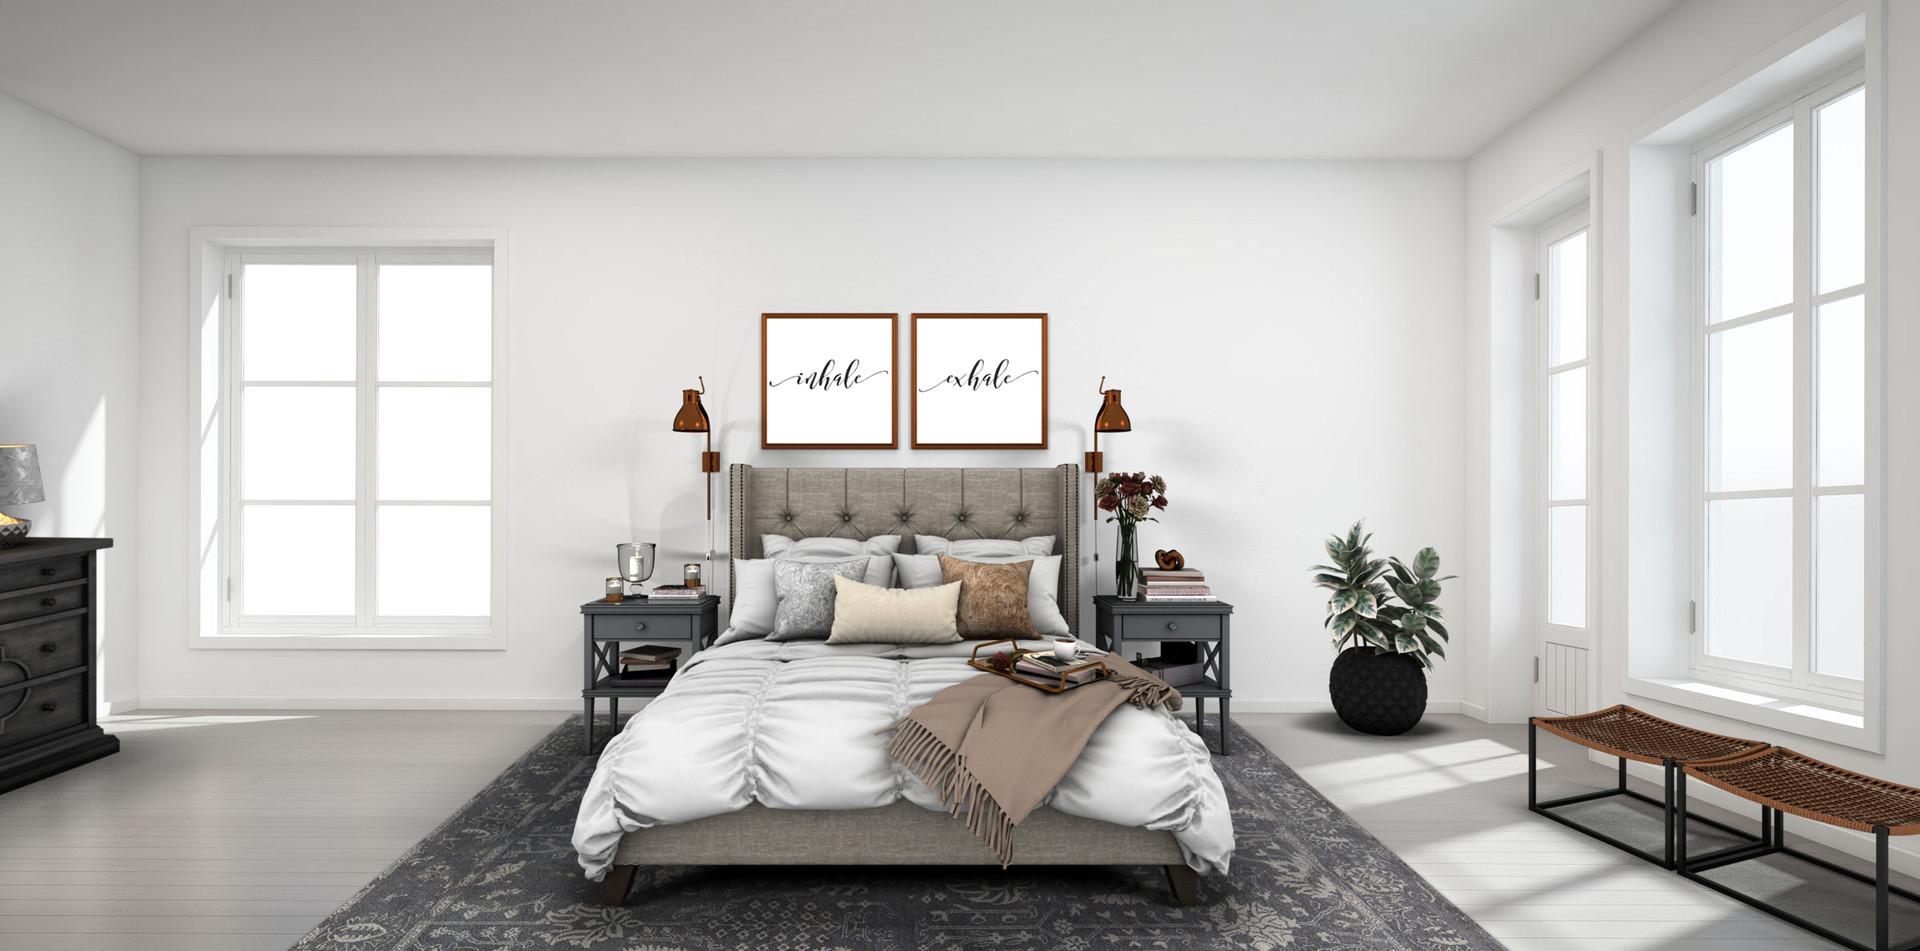 Bedroom_Staged.jpg